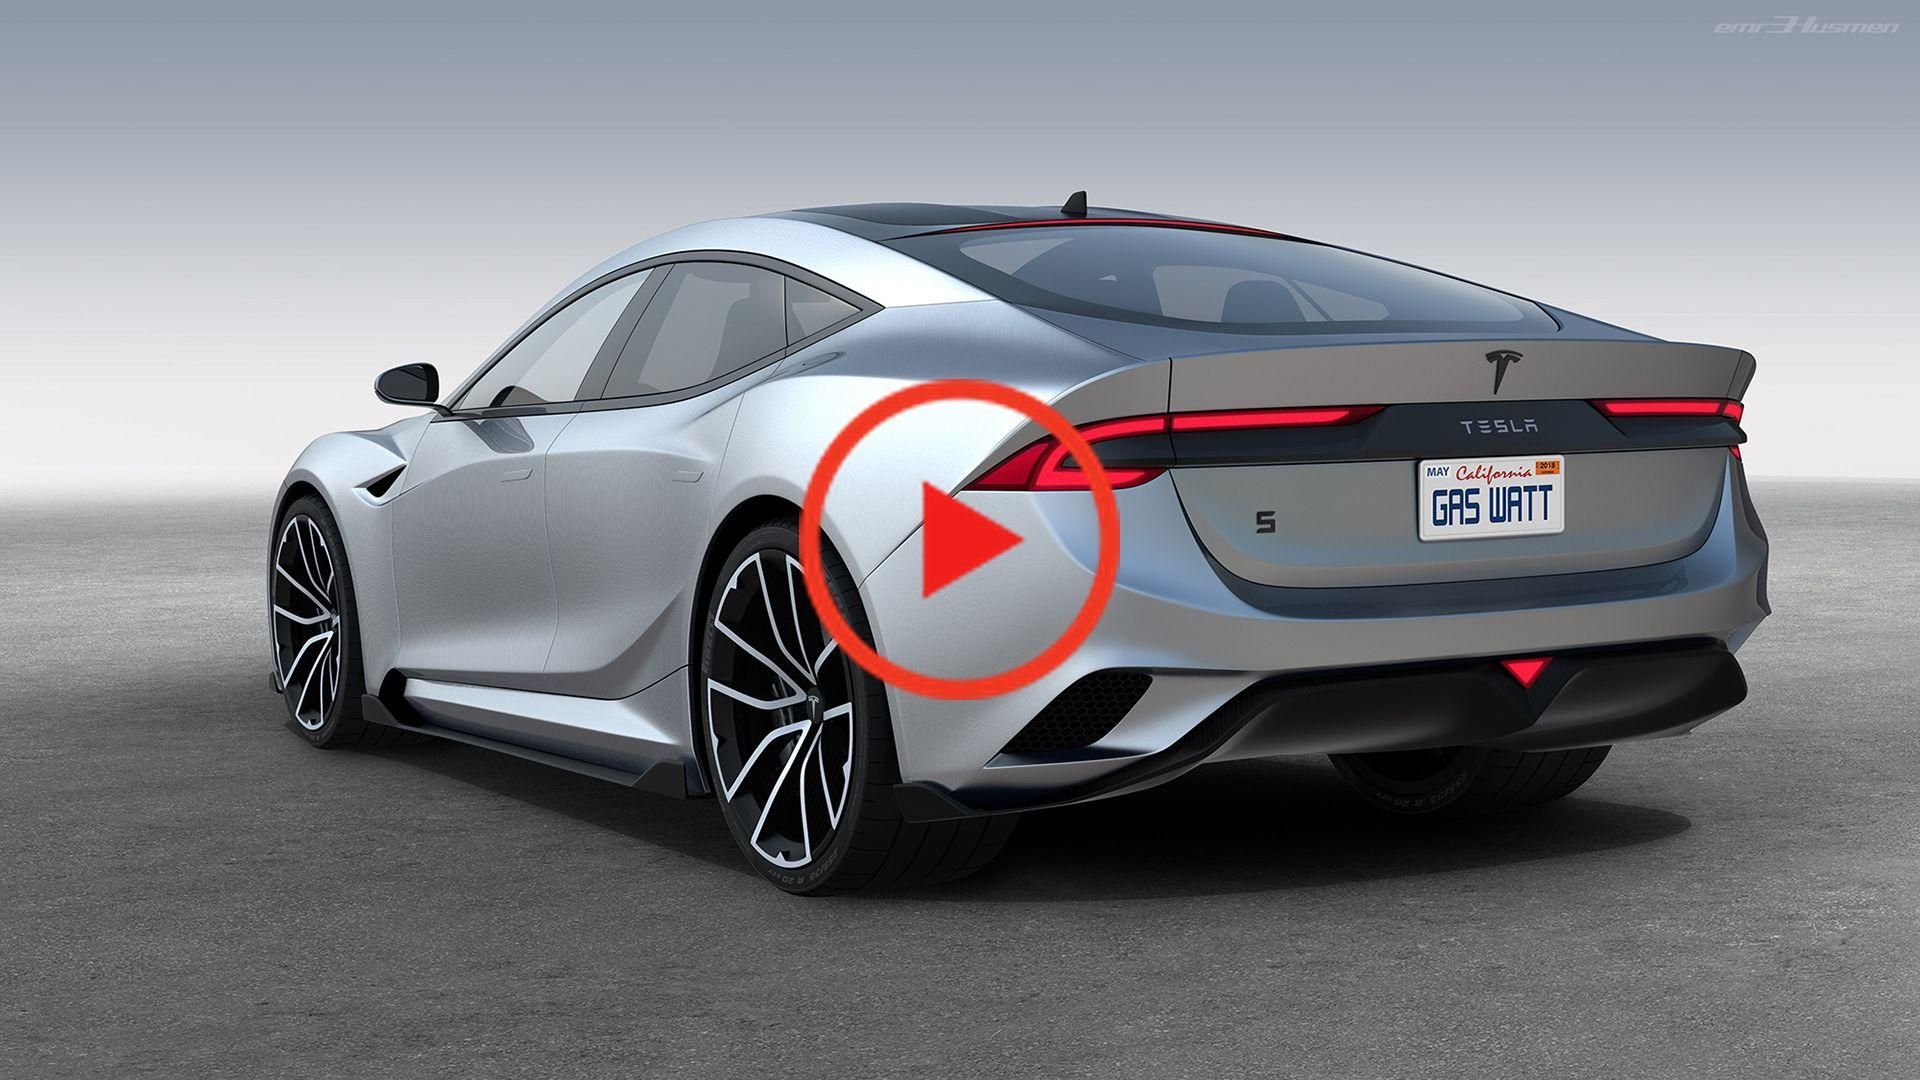 2021 Tesla Model S Rumors In 2020 Tesla Model S Tesla Model Bmw Car Models